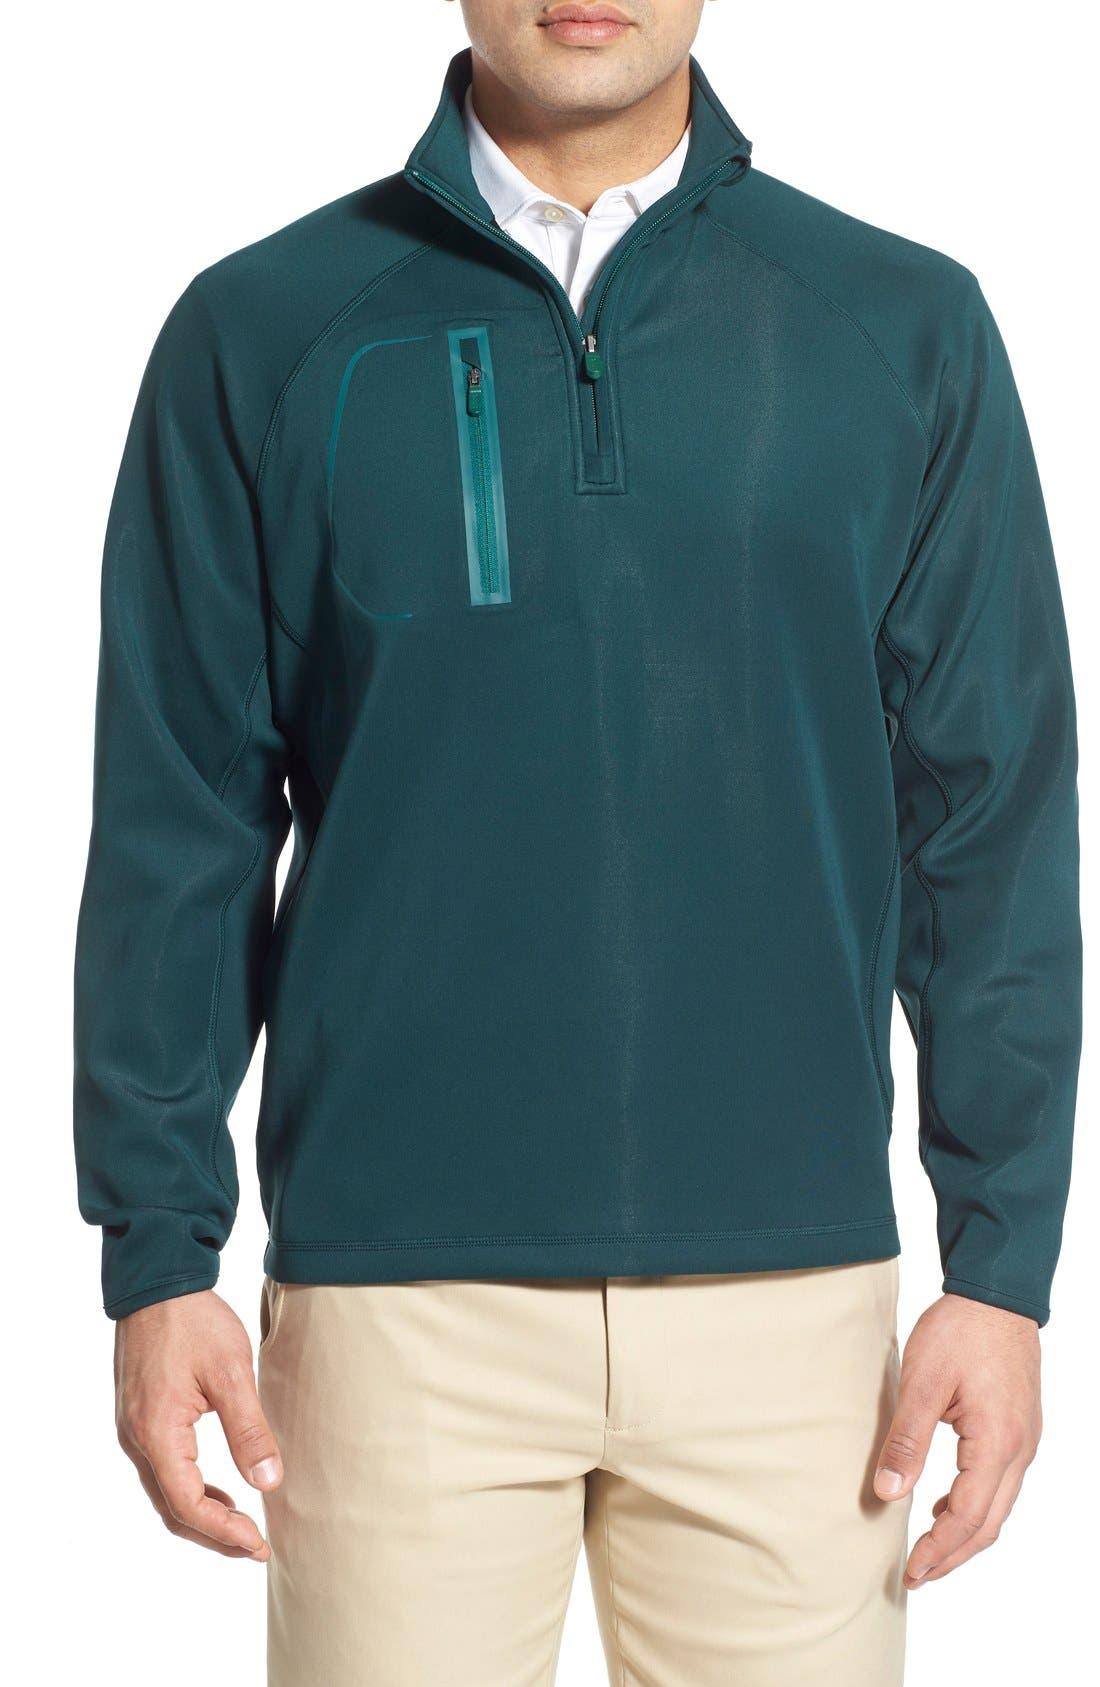 Main Image - Bobby Jones XH2O Crawford Stretch Quarter Zip Golf Pullover